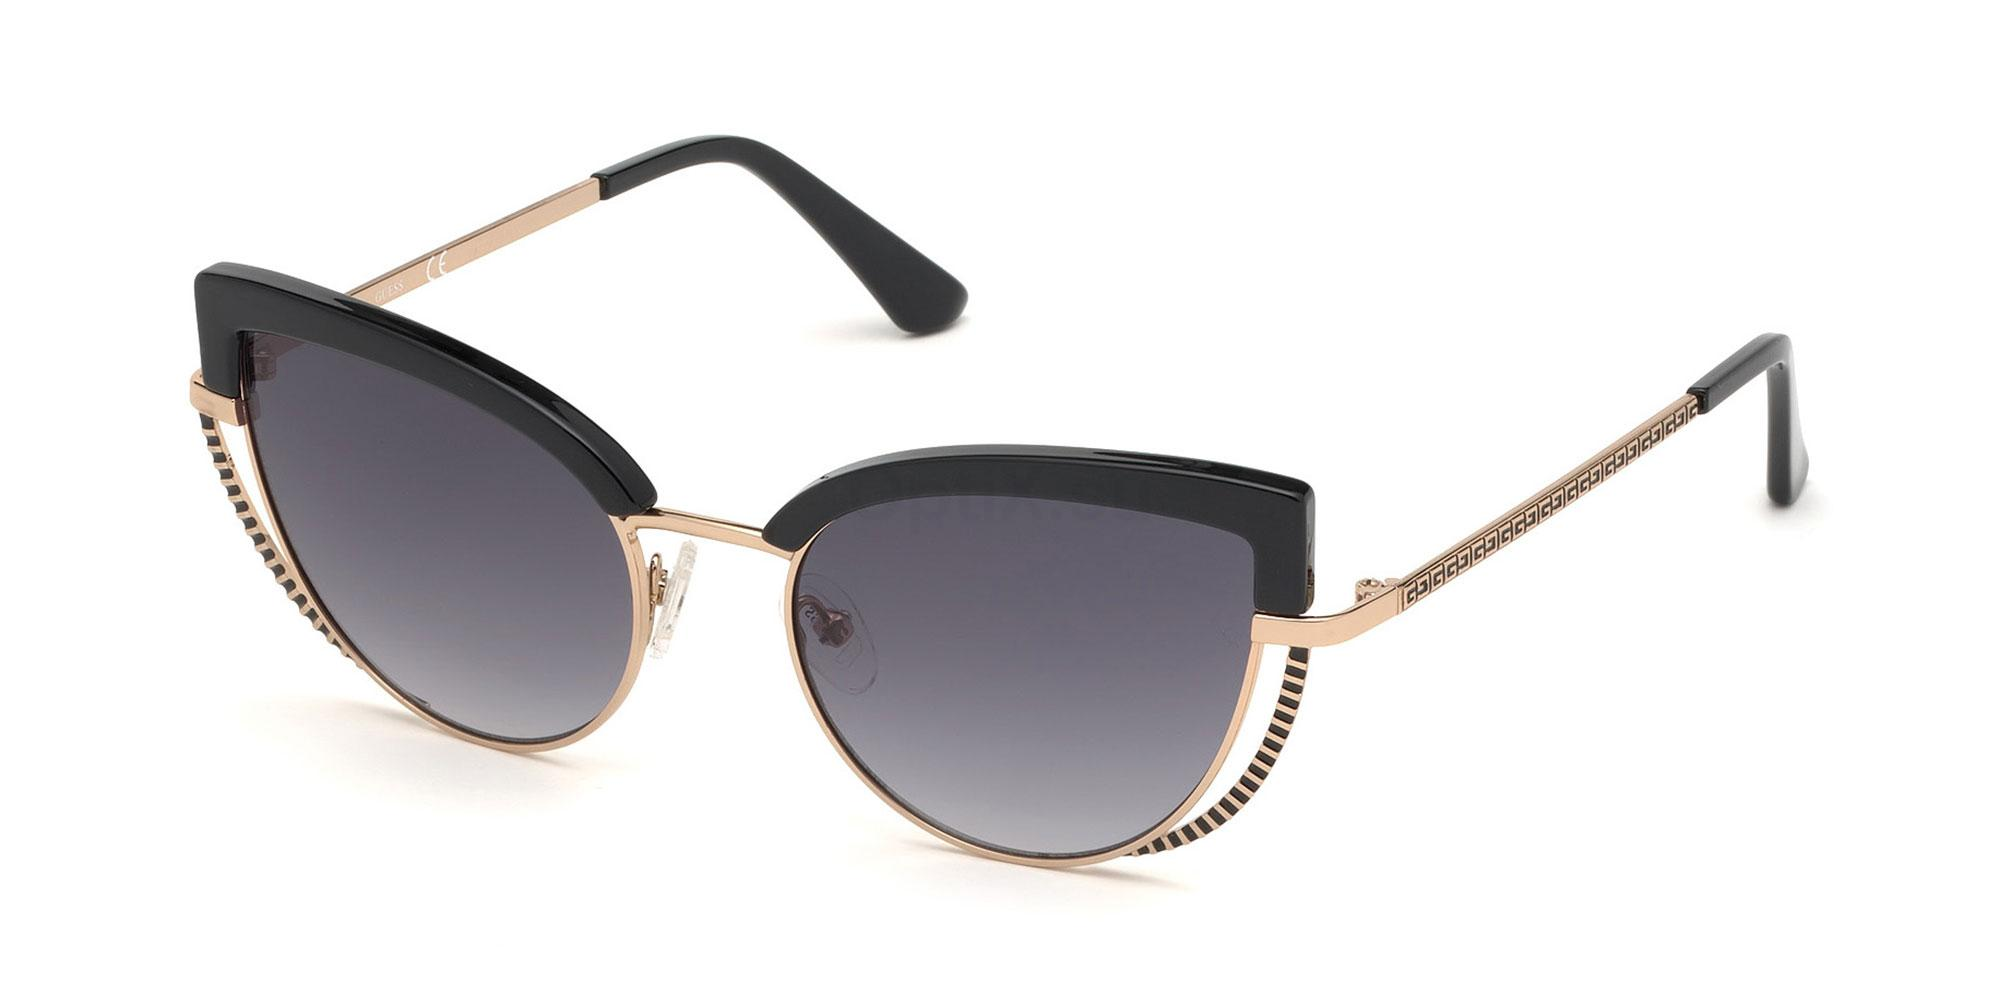 01B GU7622 Sunglasses, Guess